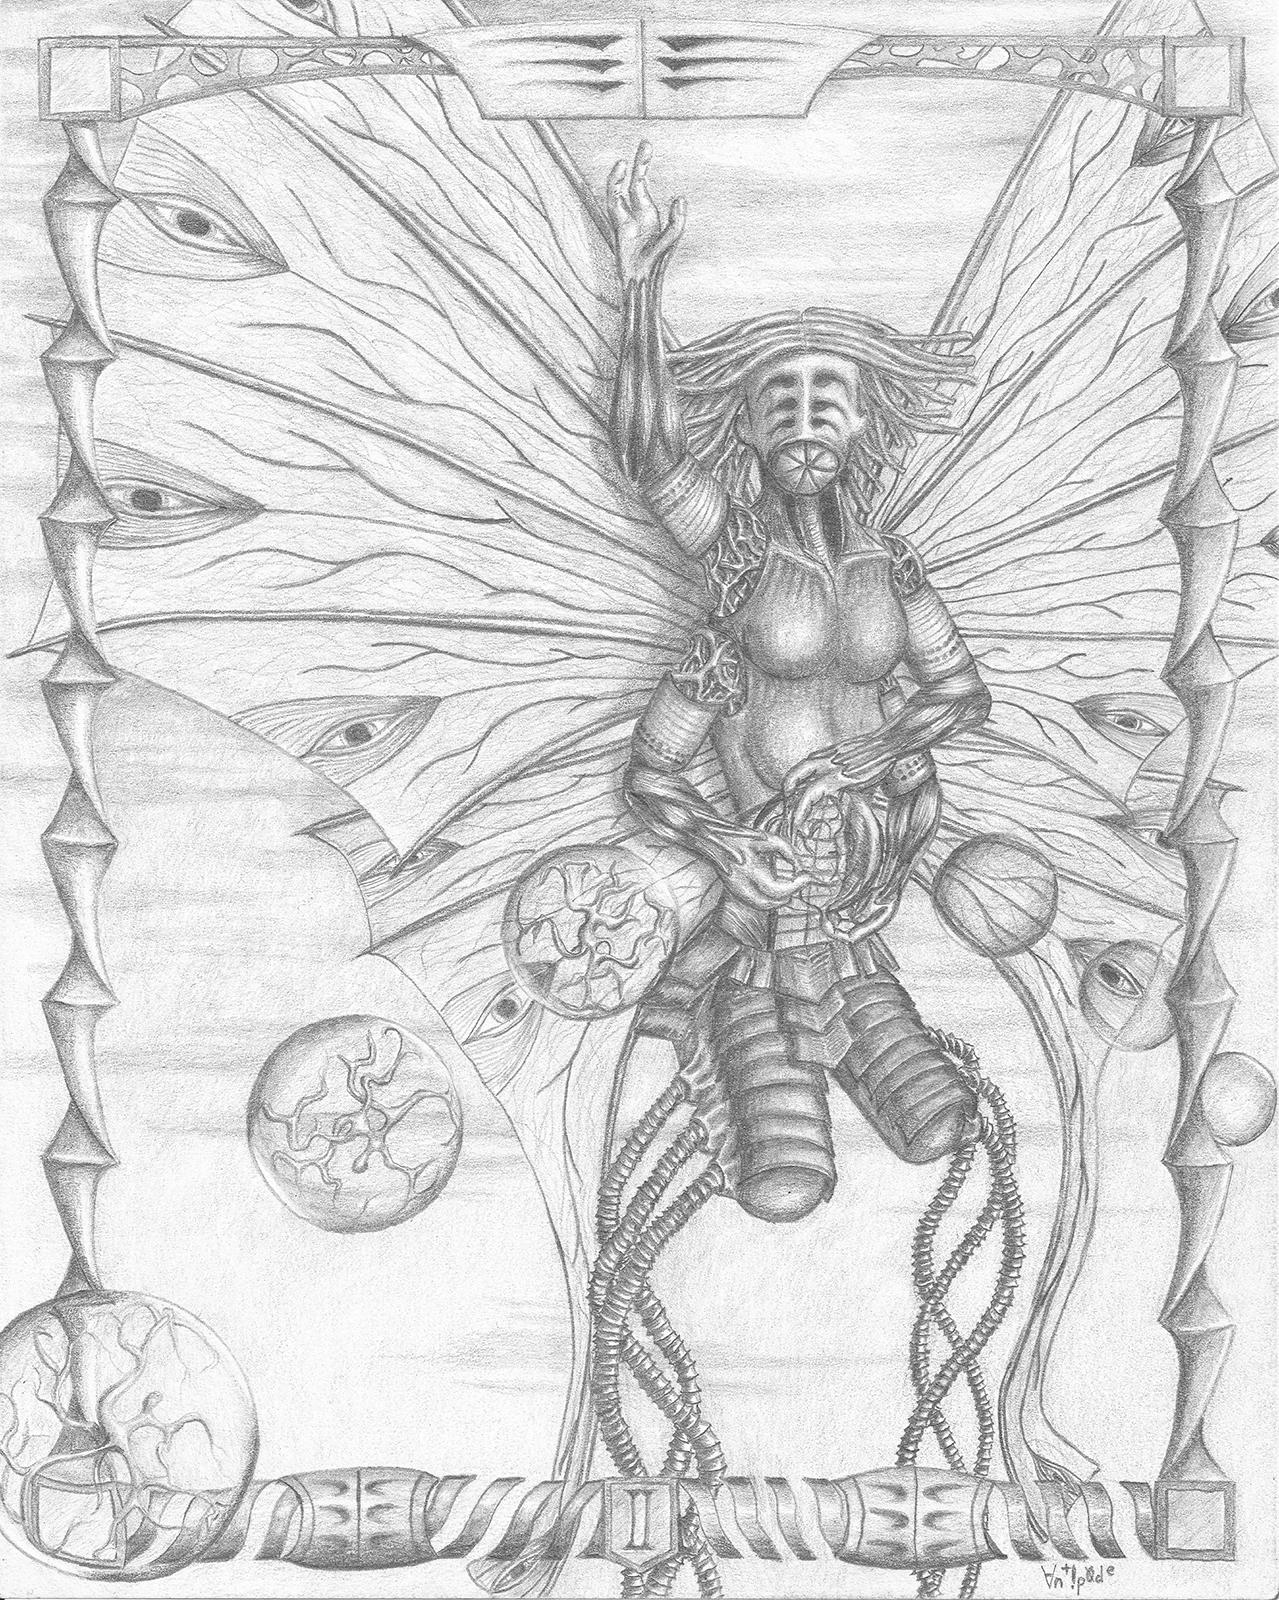 "II, graphite on paper, 8x10"", 2015"